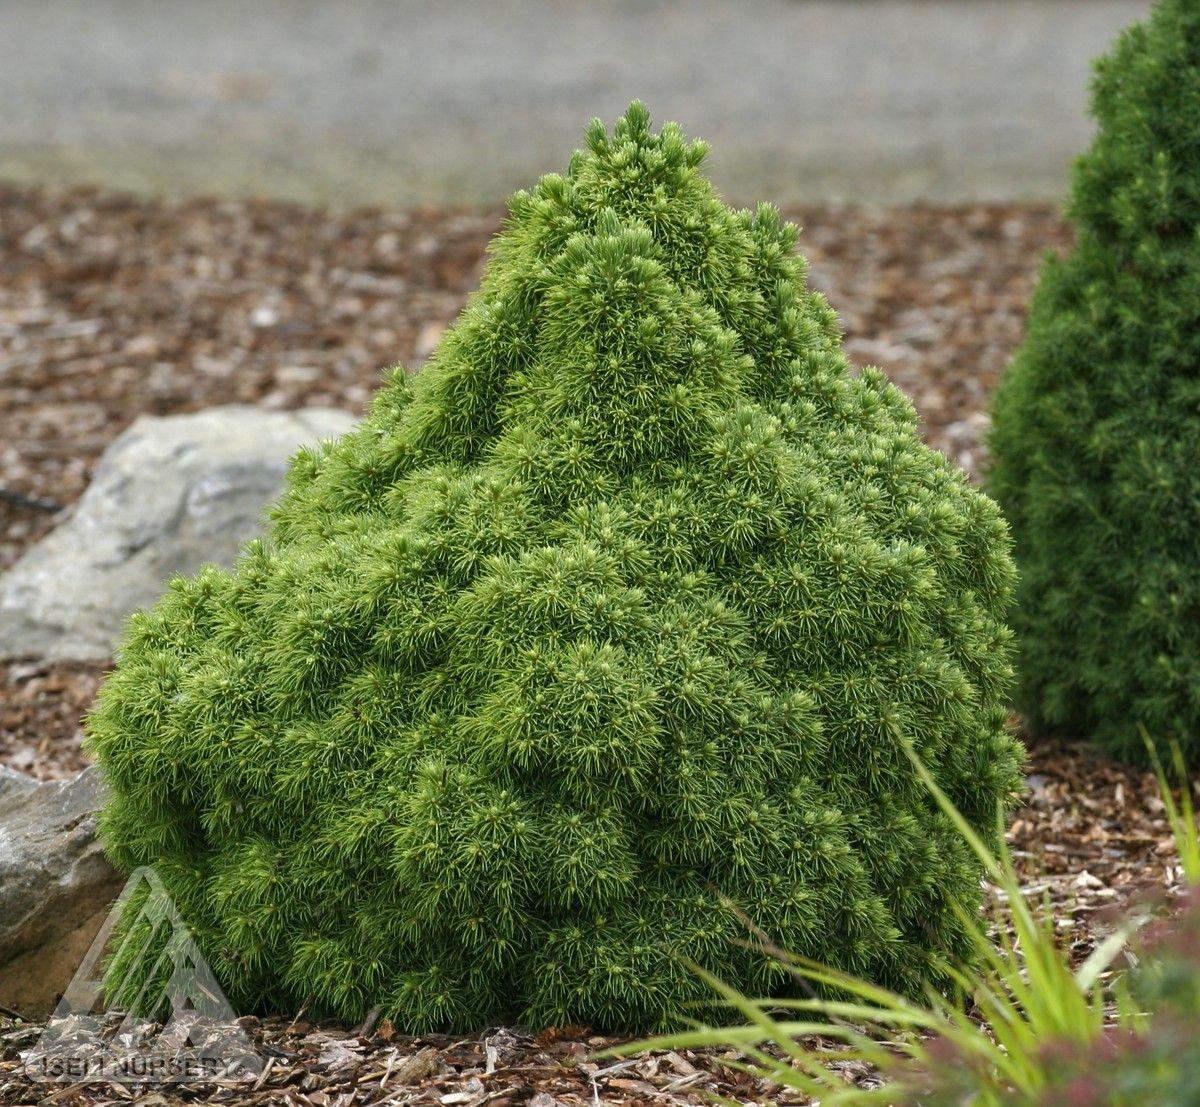 Picea glauca humpty dumpty dwarf alberta spruce dwarf bonsai reviewsmspy